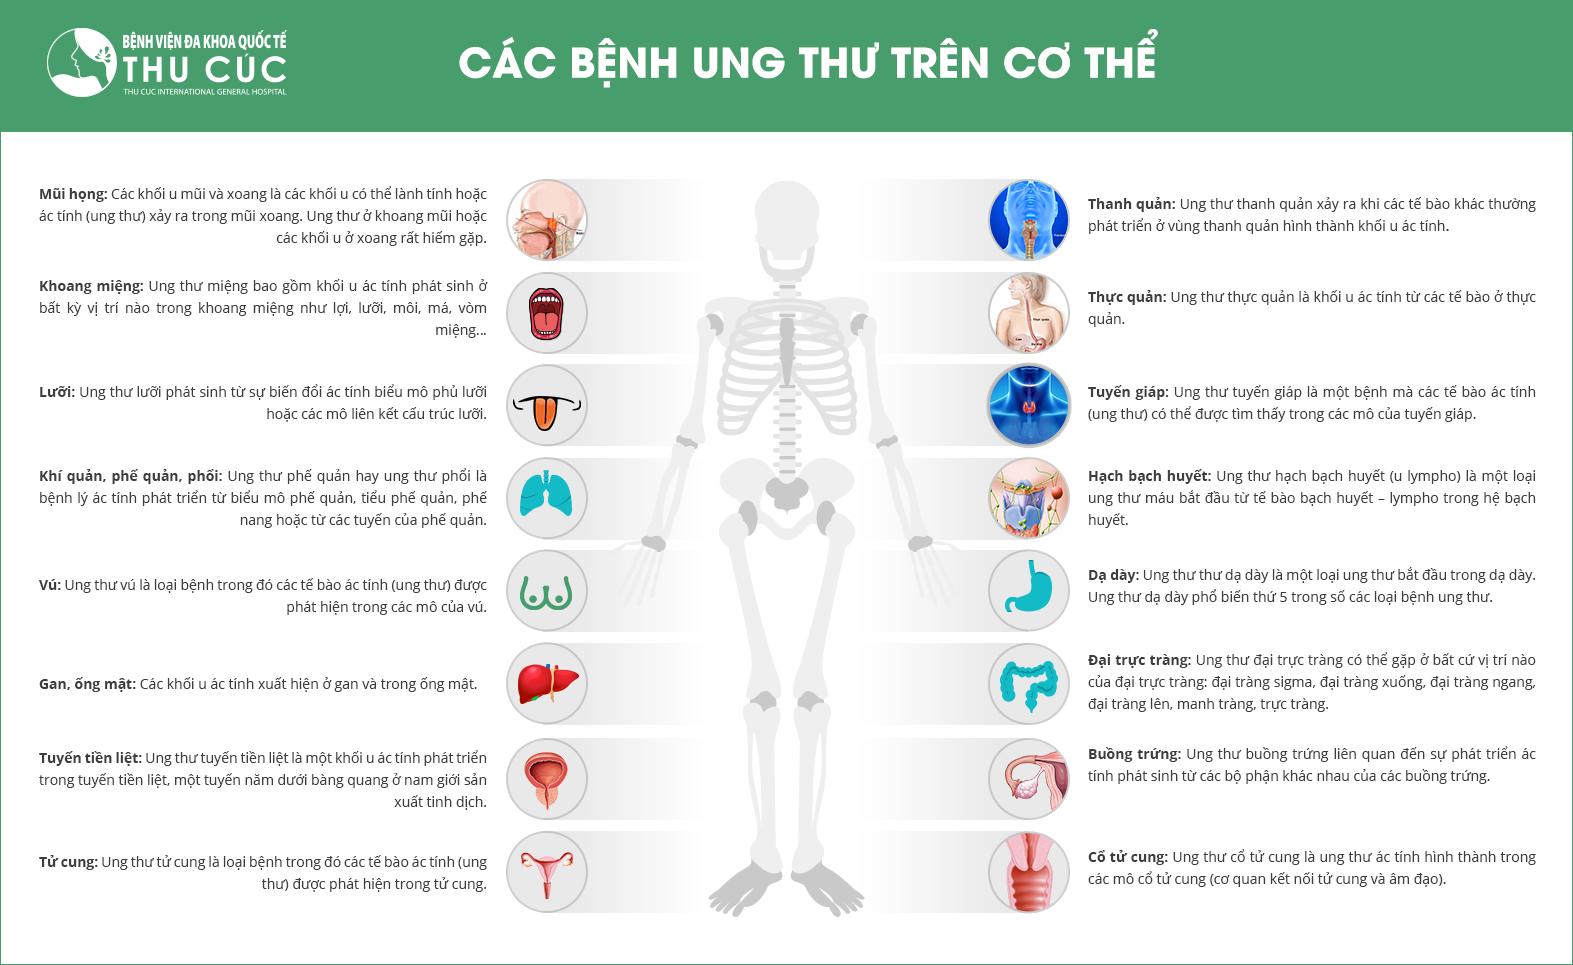 nhung-benh-ung-thu-tren-co-the